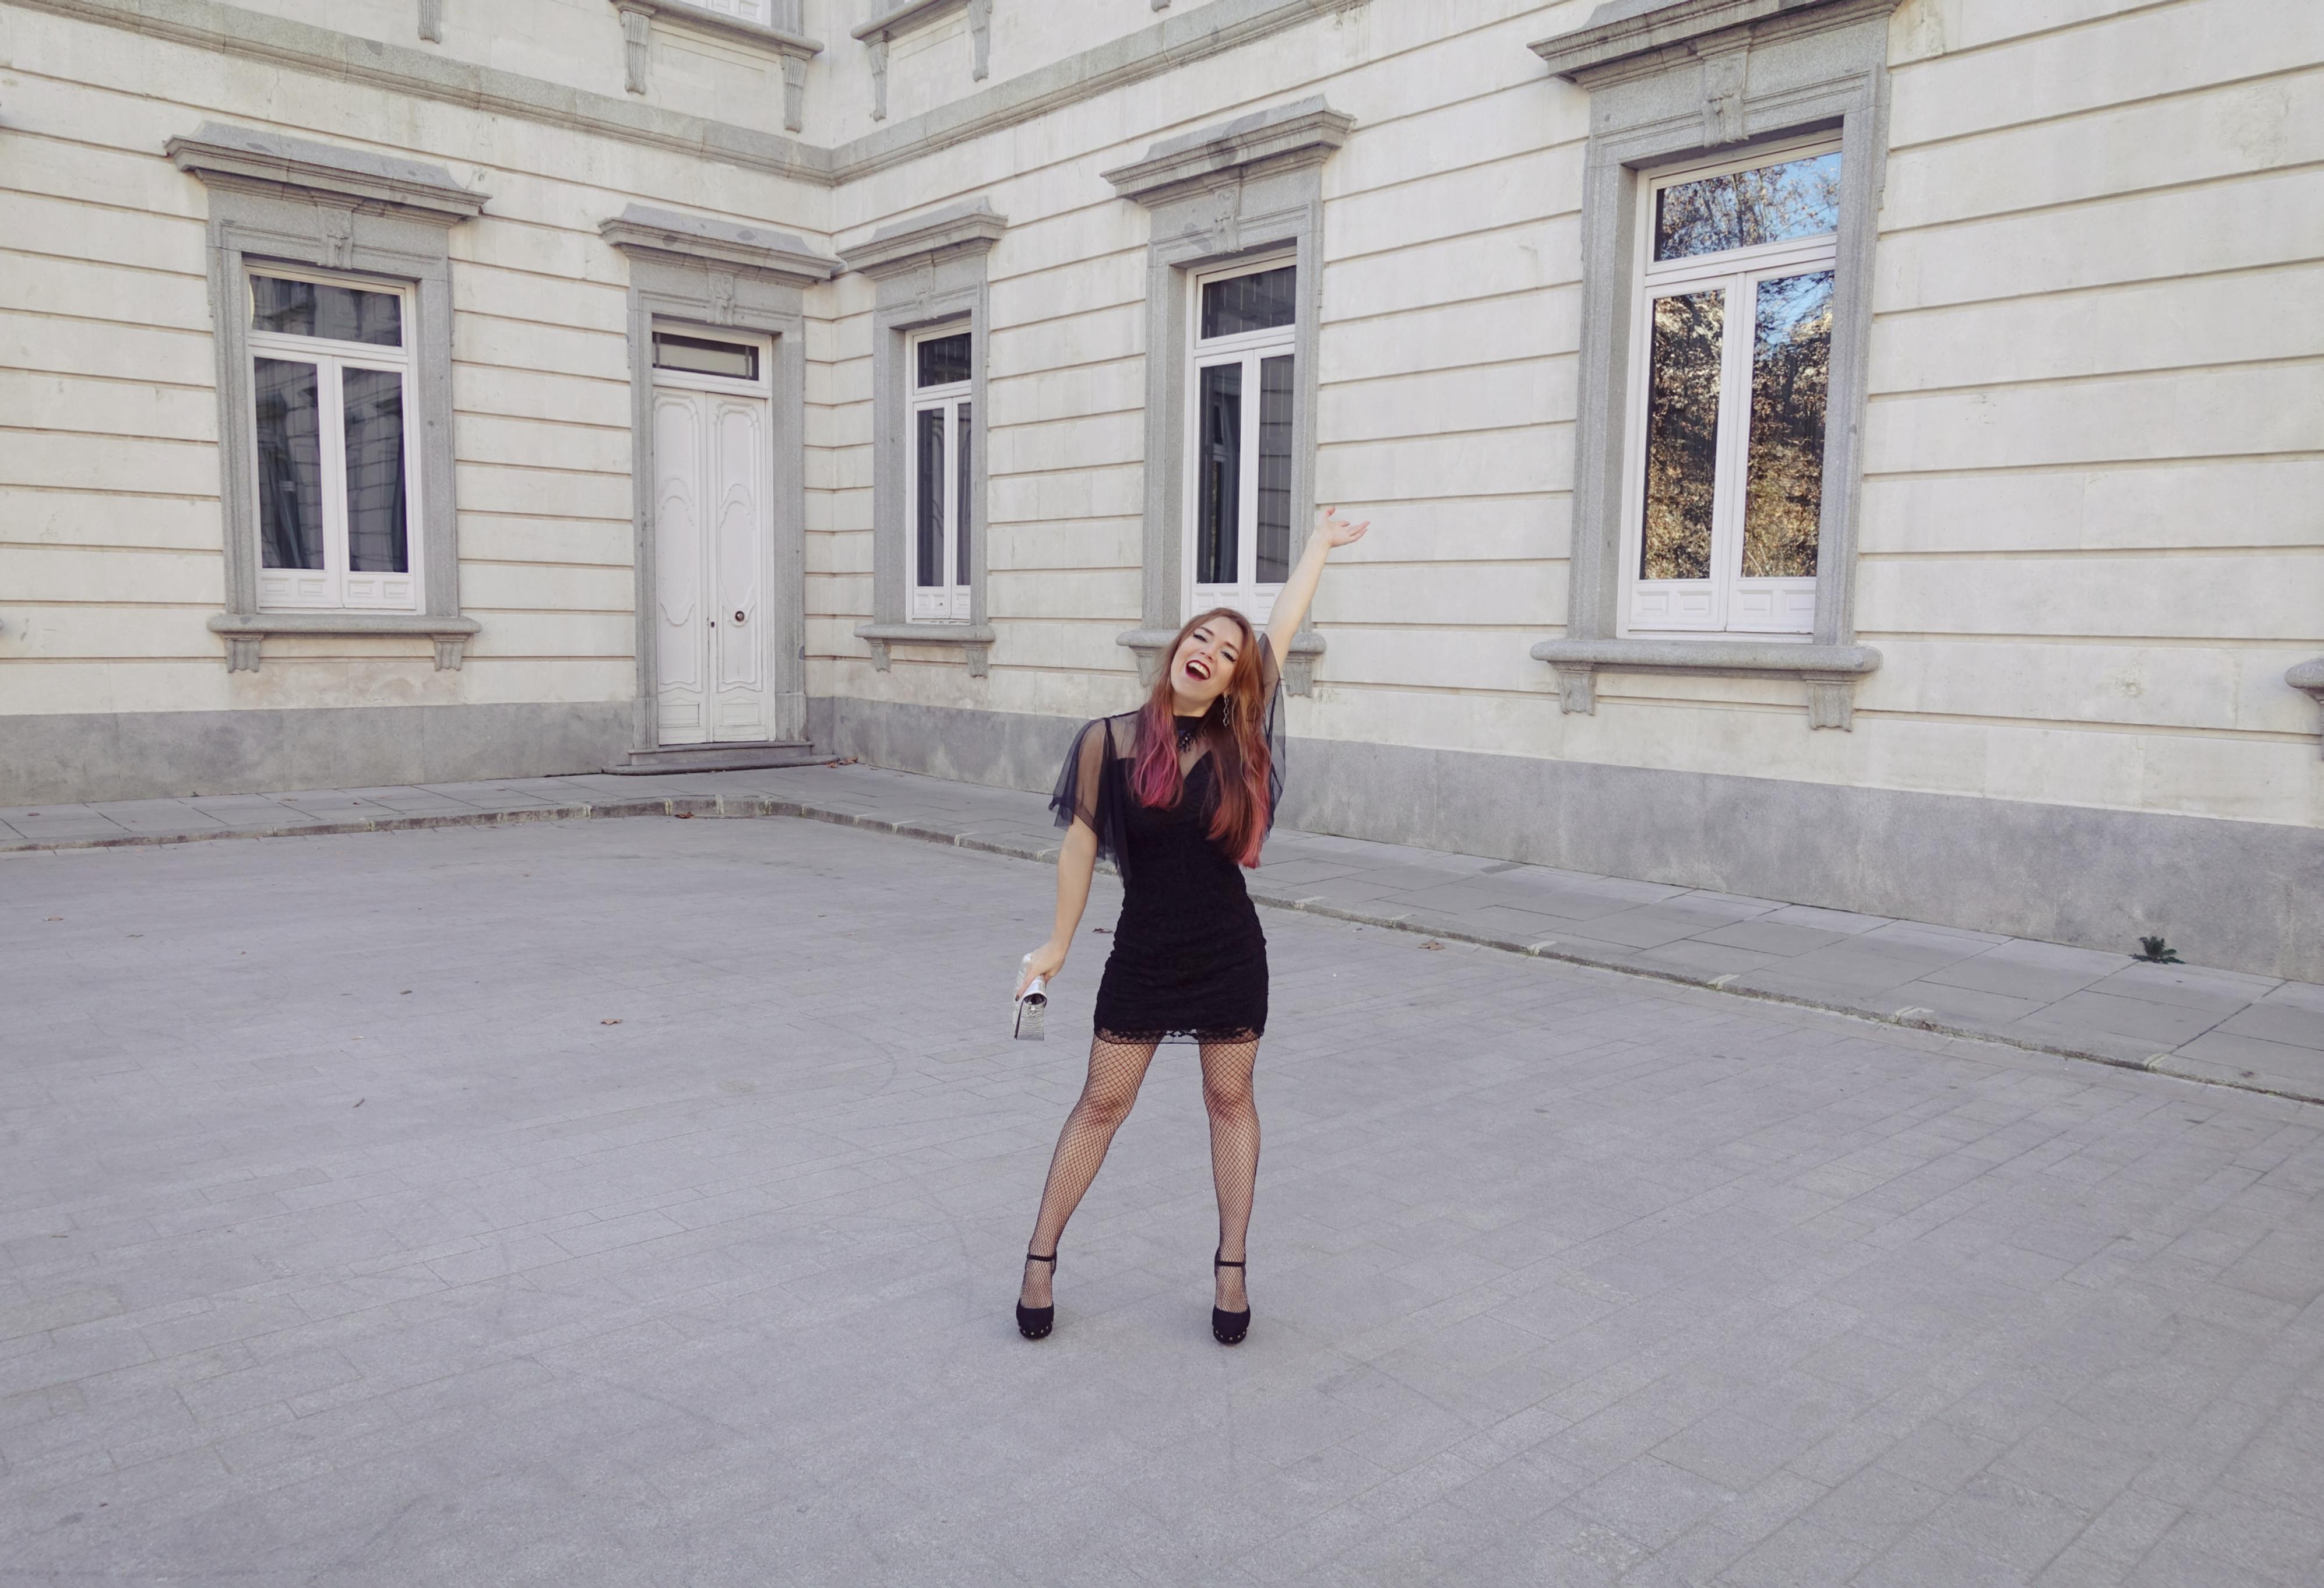 Blog-de-moda-Chicadicta-influencer-Piensaenchic-fashionista-look-noche-vieja-vestido-molly-bracken-chic-adicta-madrid-Piensa-en-Chic